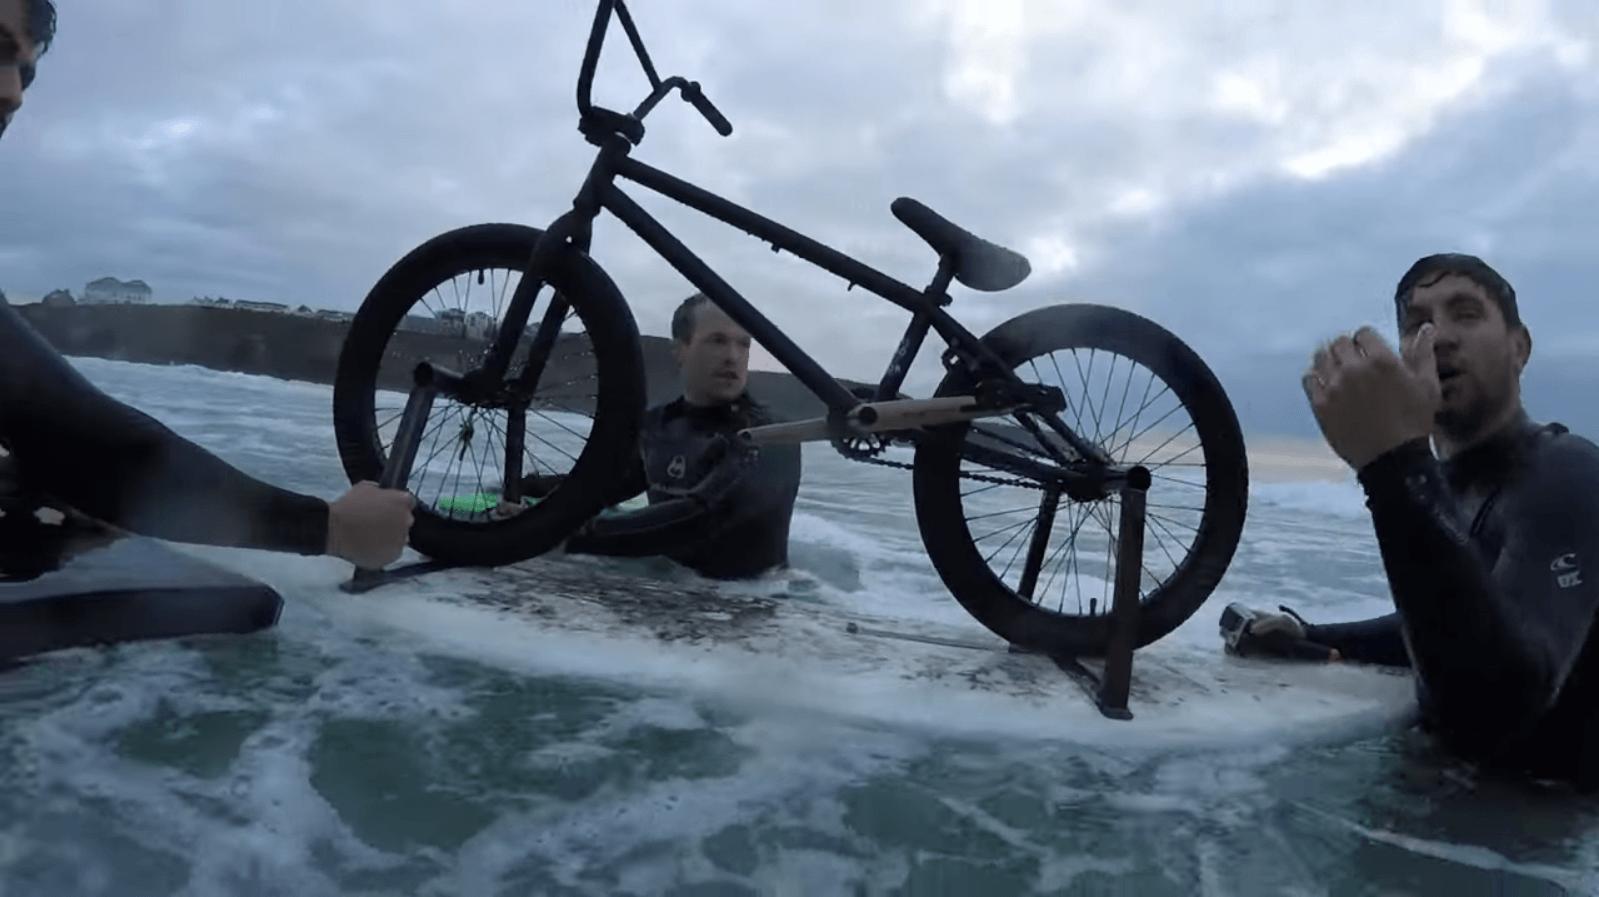 Dead Sailor: BMX Surf Boarding